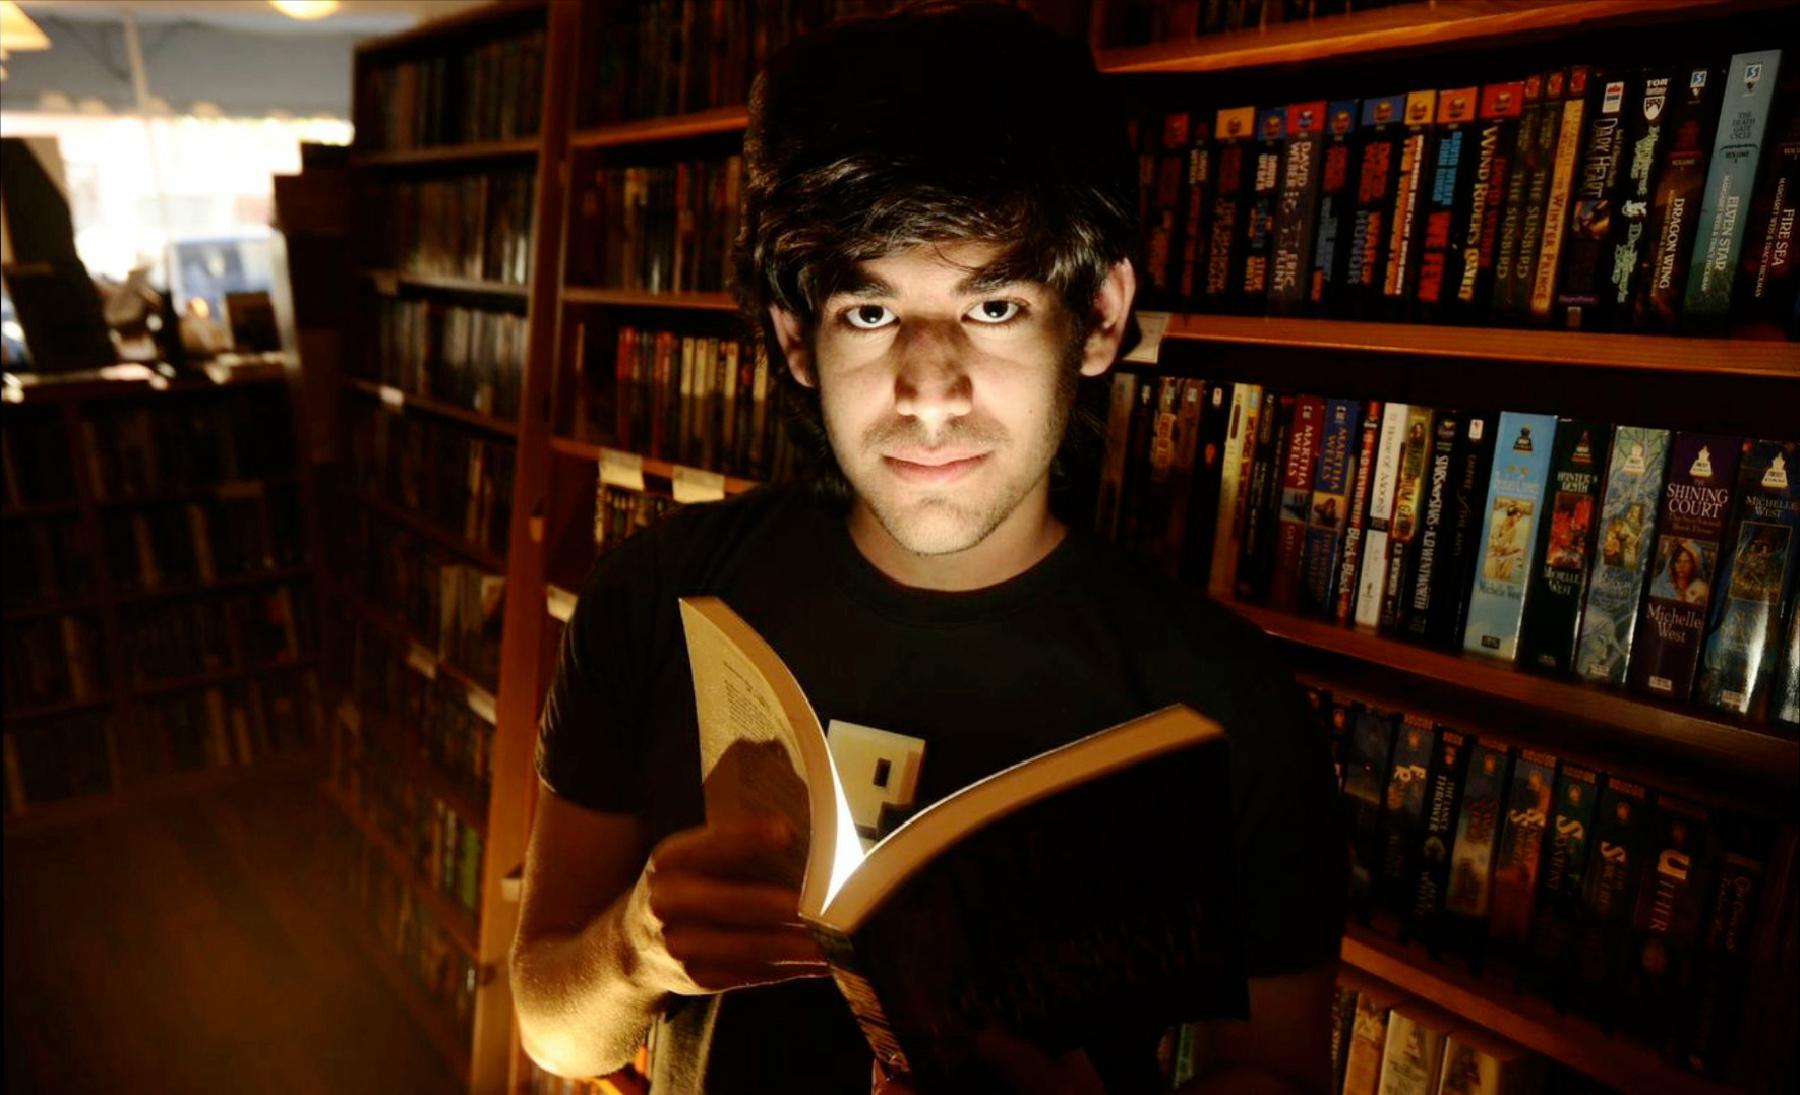 The Extraordinary Aaron Swartz: Sundance Sees 'The Internet's Own Boy'